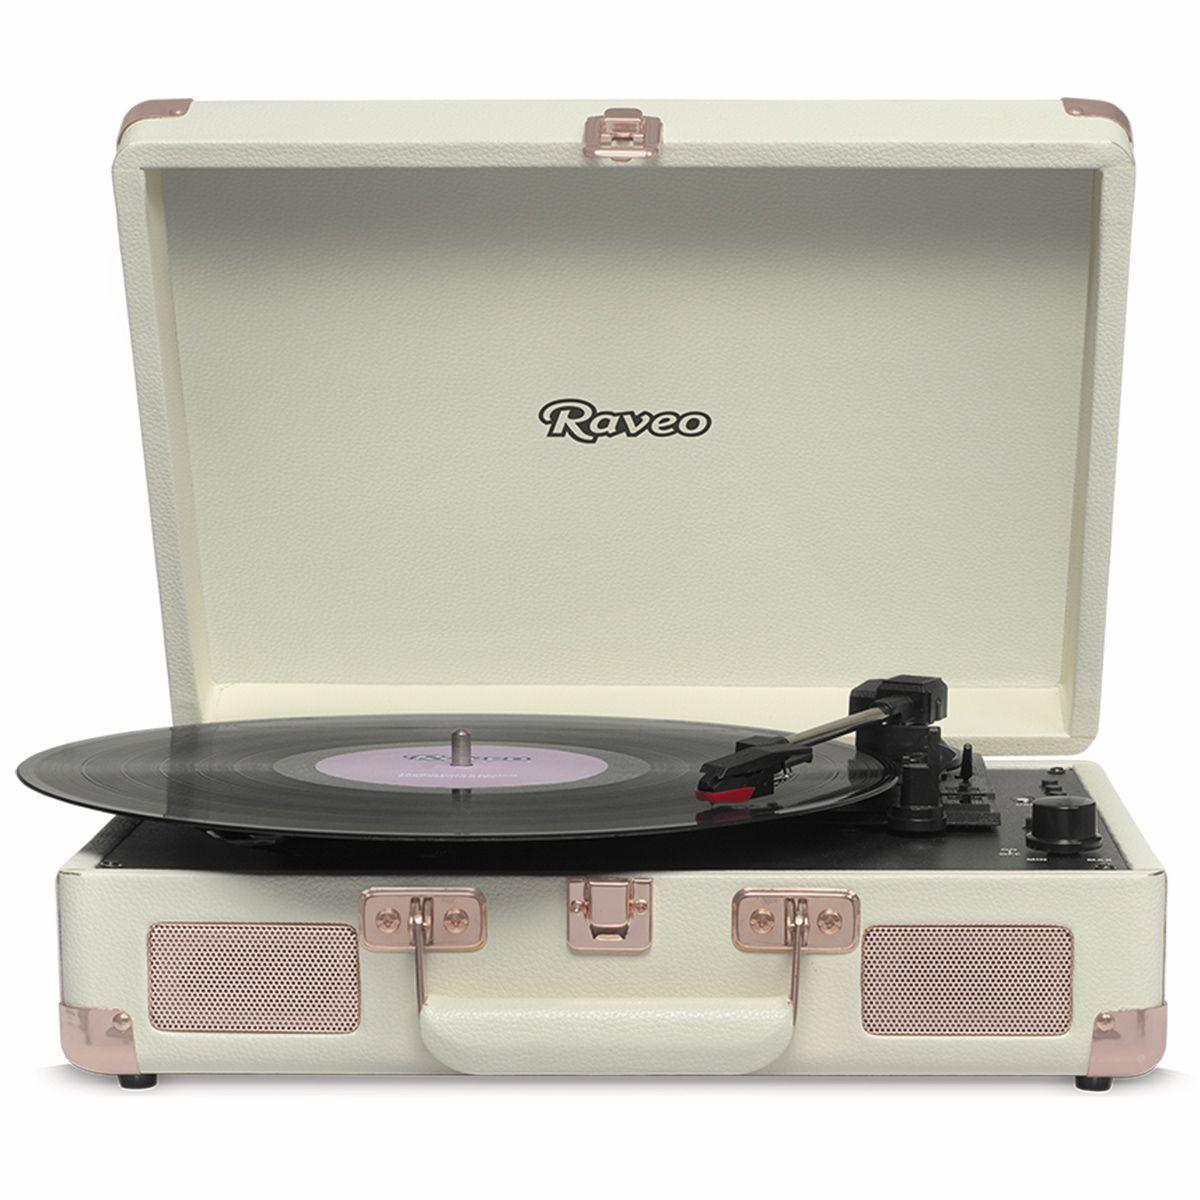 Vitrola Raveo Sonetto Rose Gold C/bluetooth USB Gravação